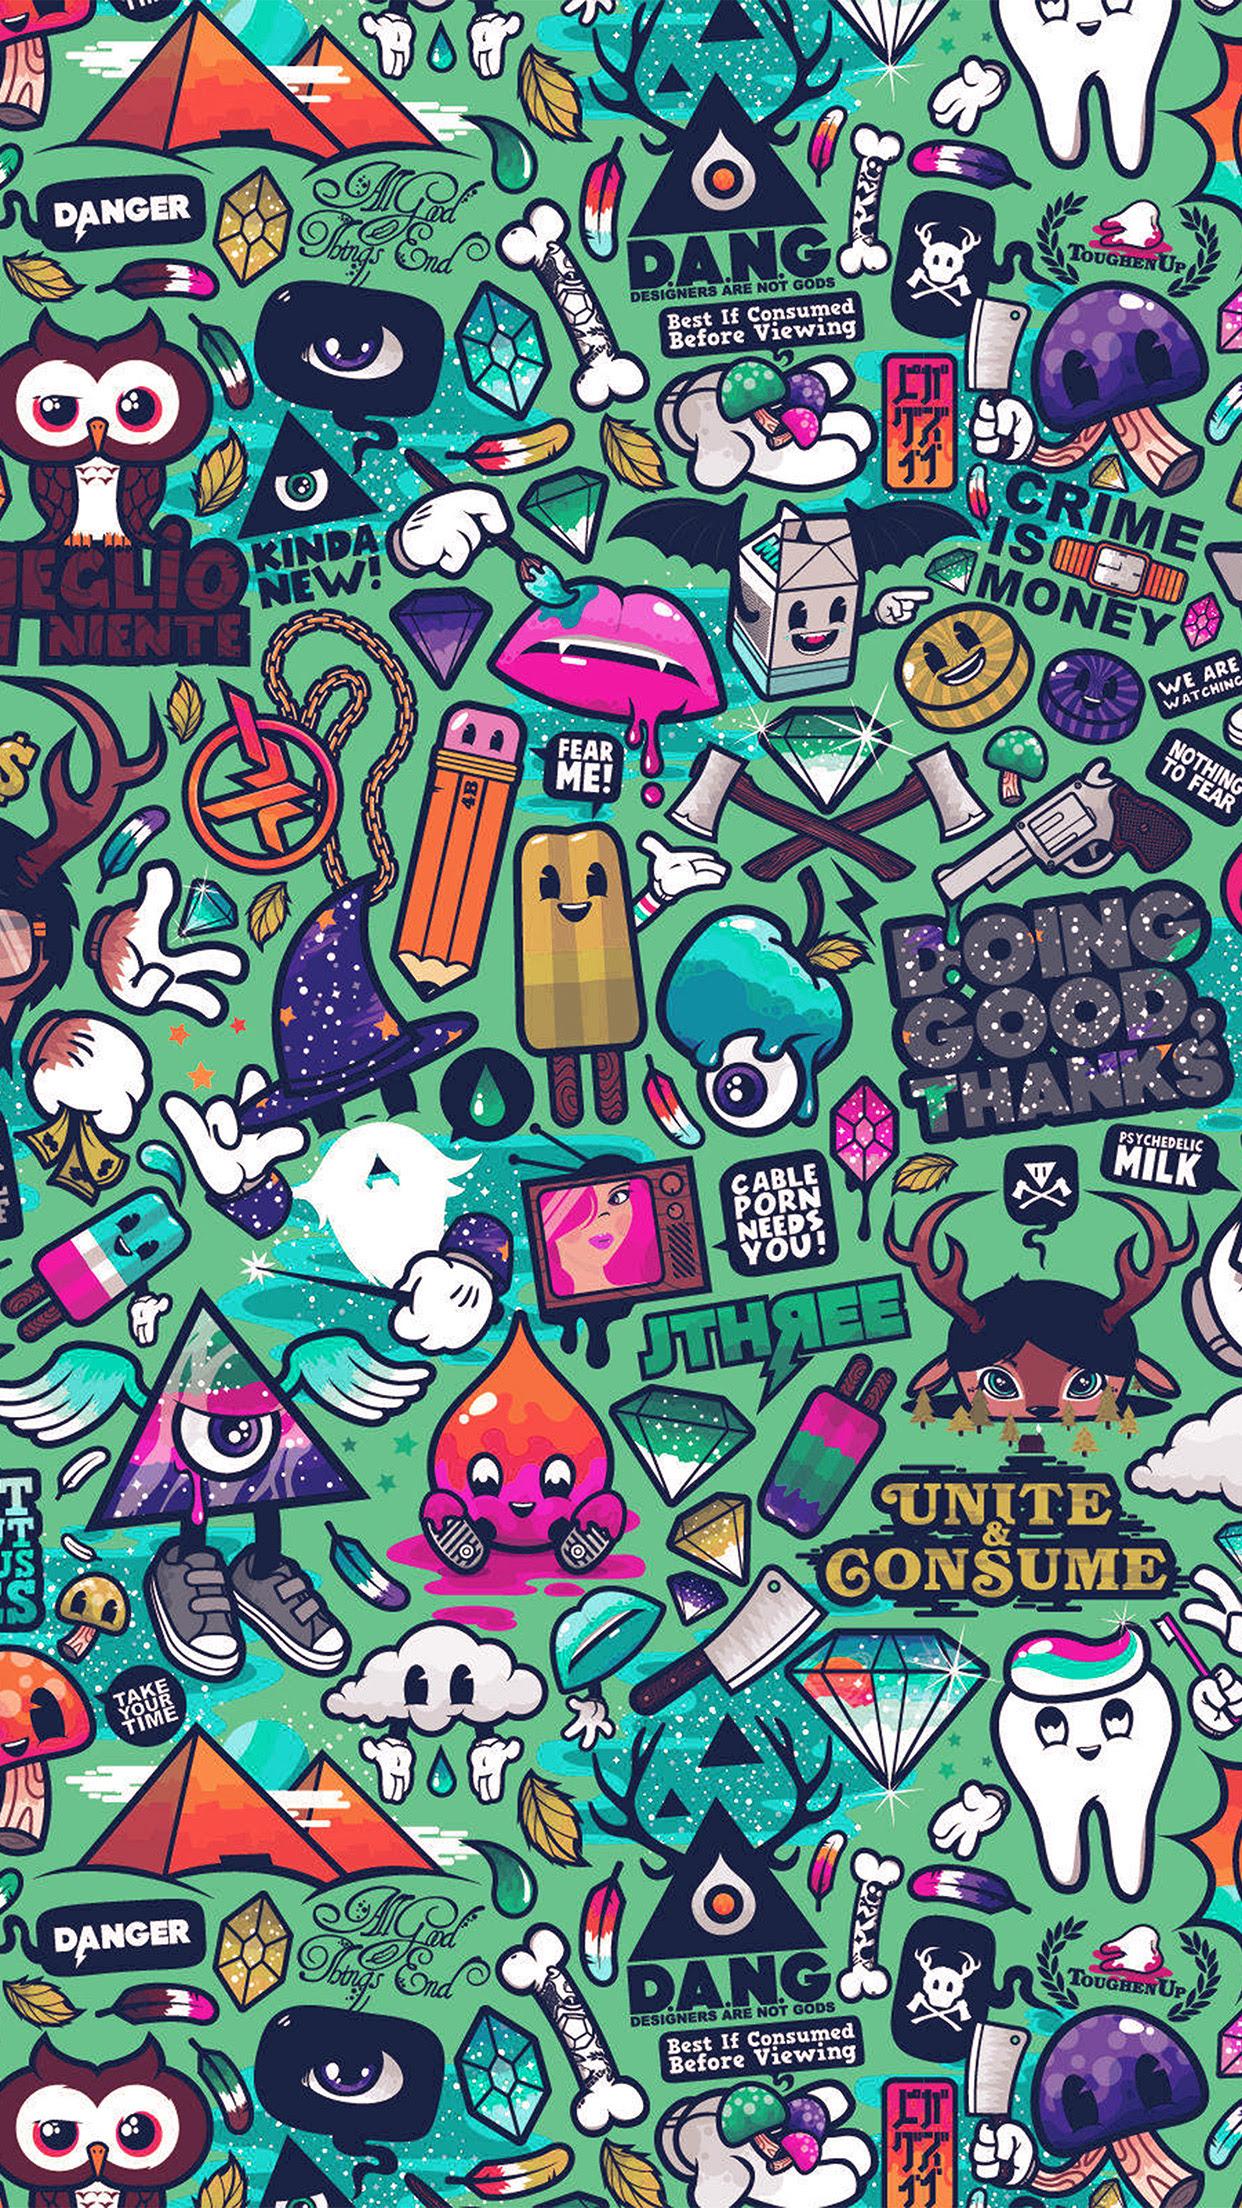 Papers Co Iphone Wallpaper Aq62 Art Work Pattern Illustration Graffiti Green